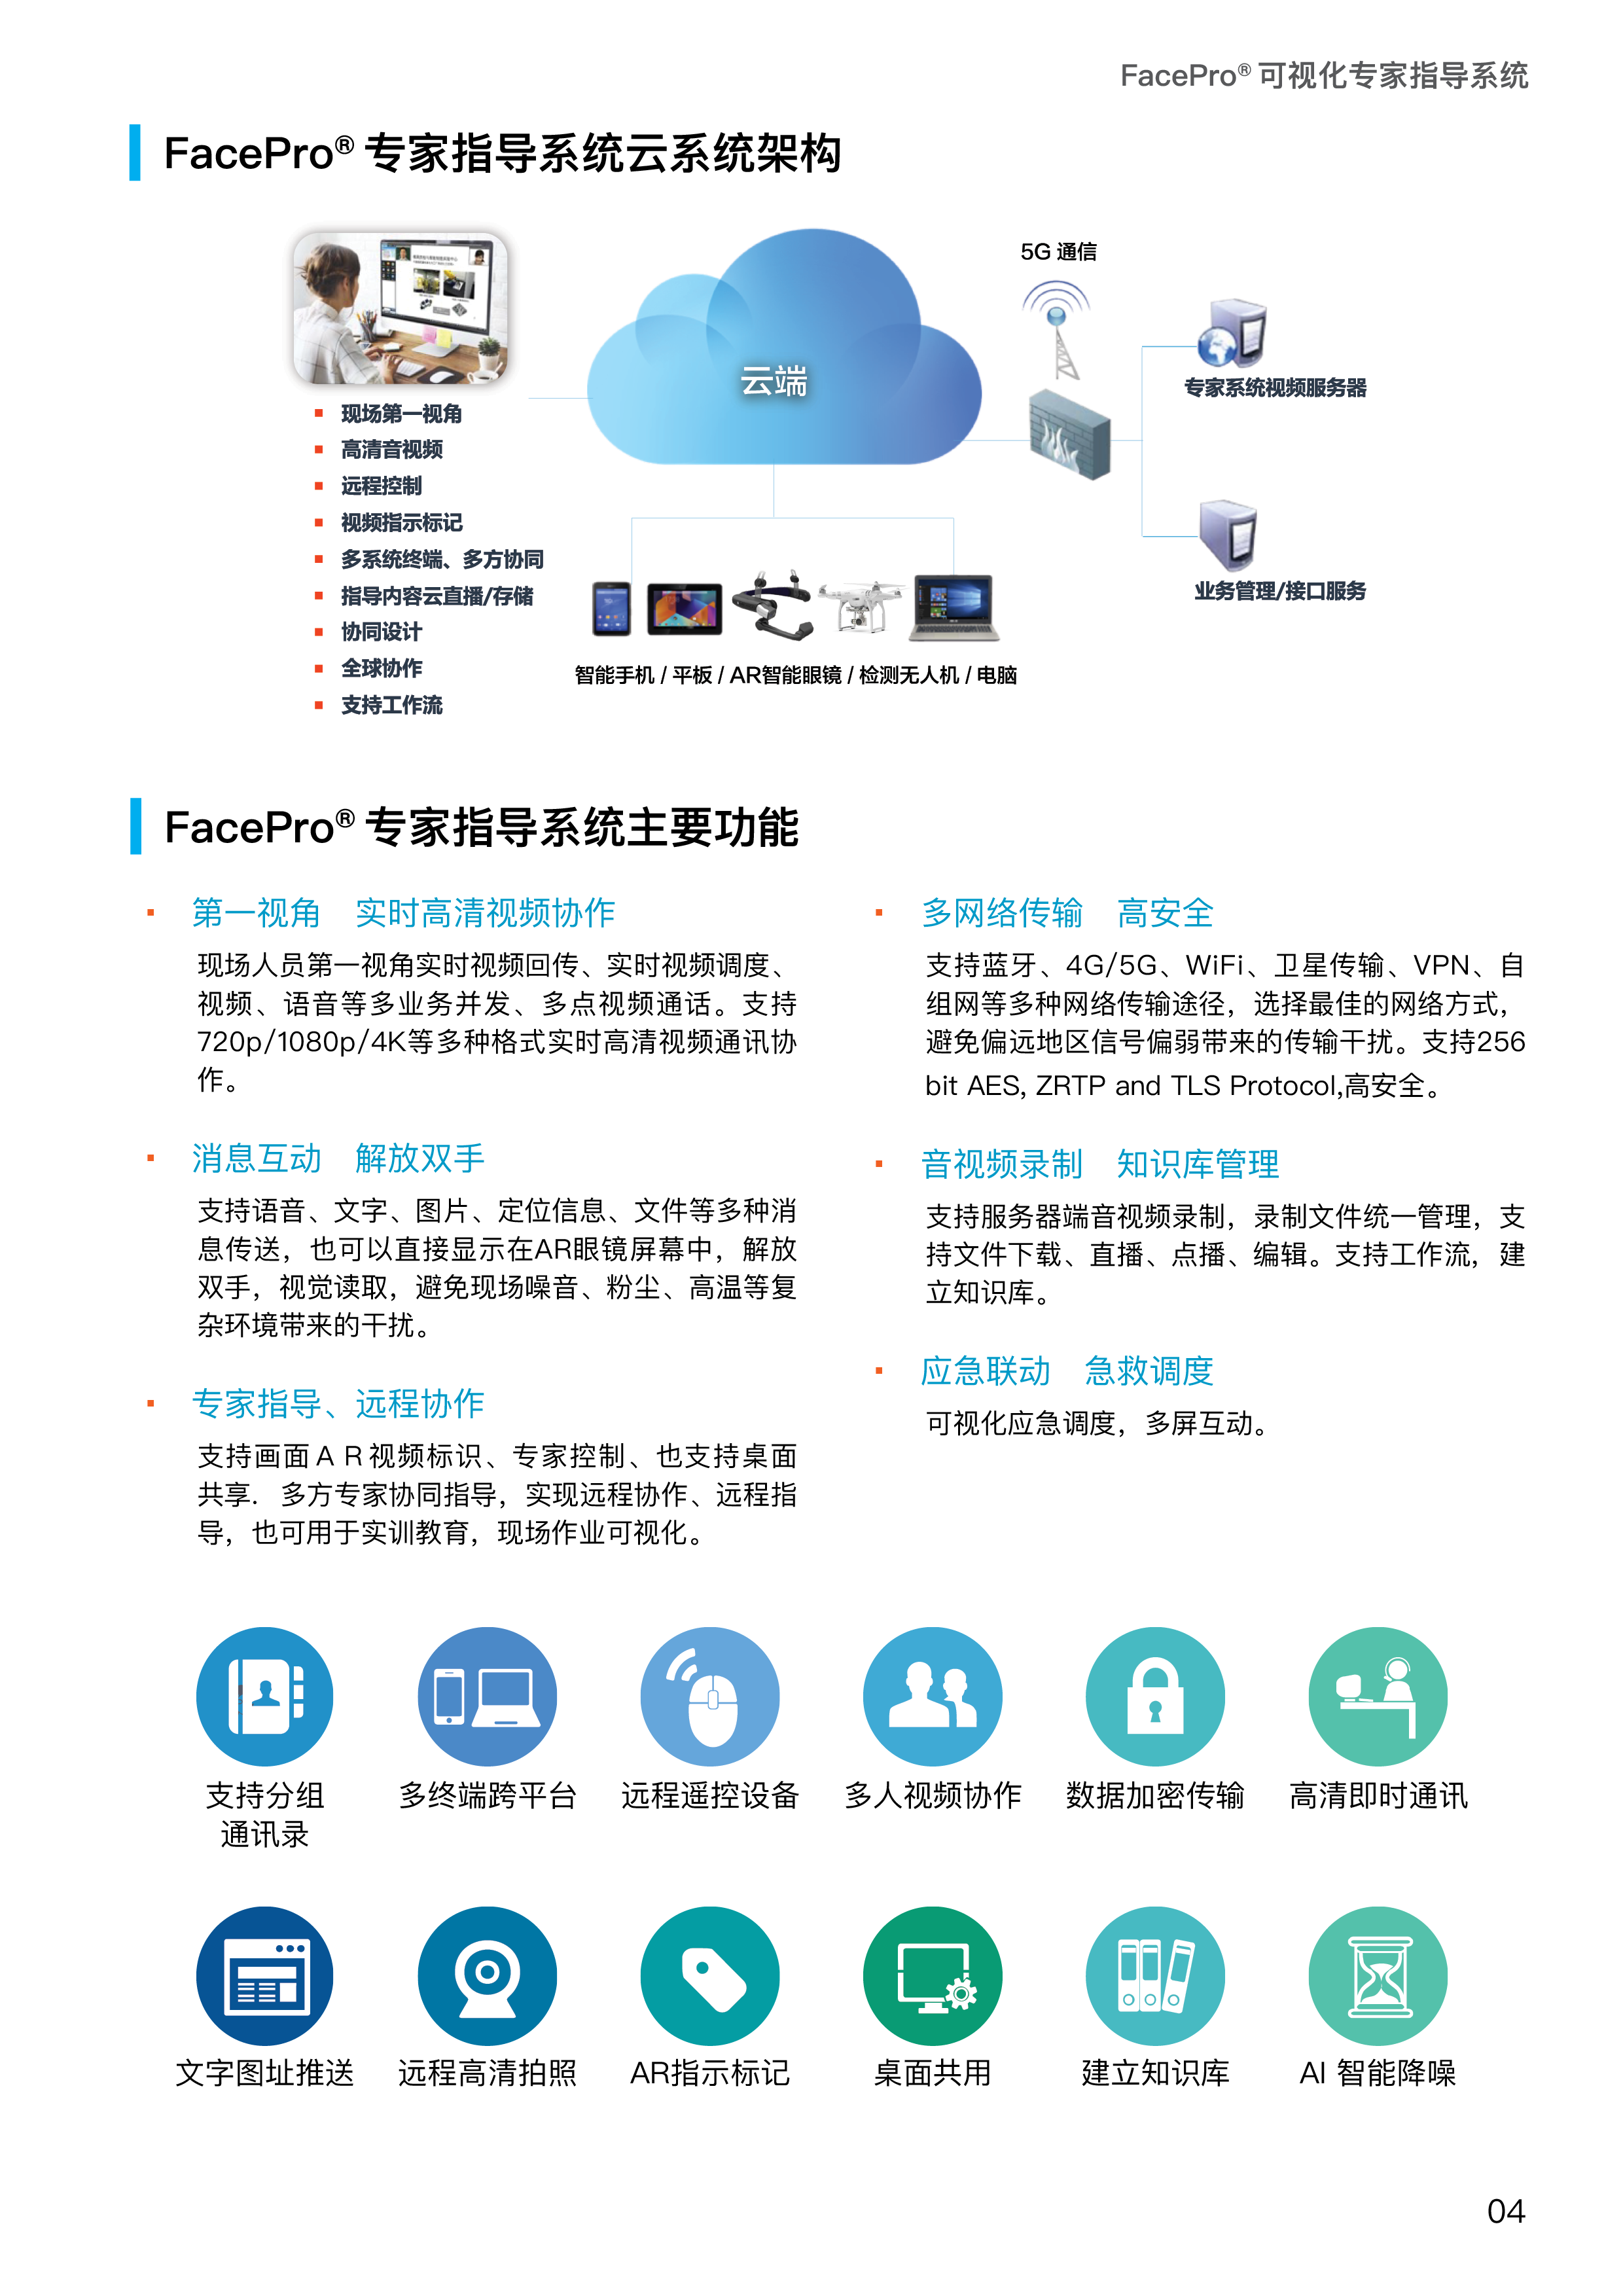 FacePro Xpert 远程专家指导系统